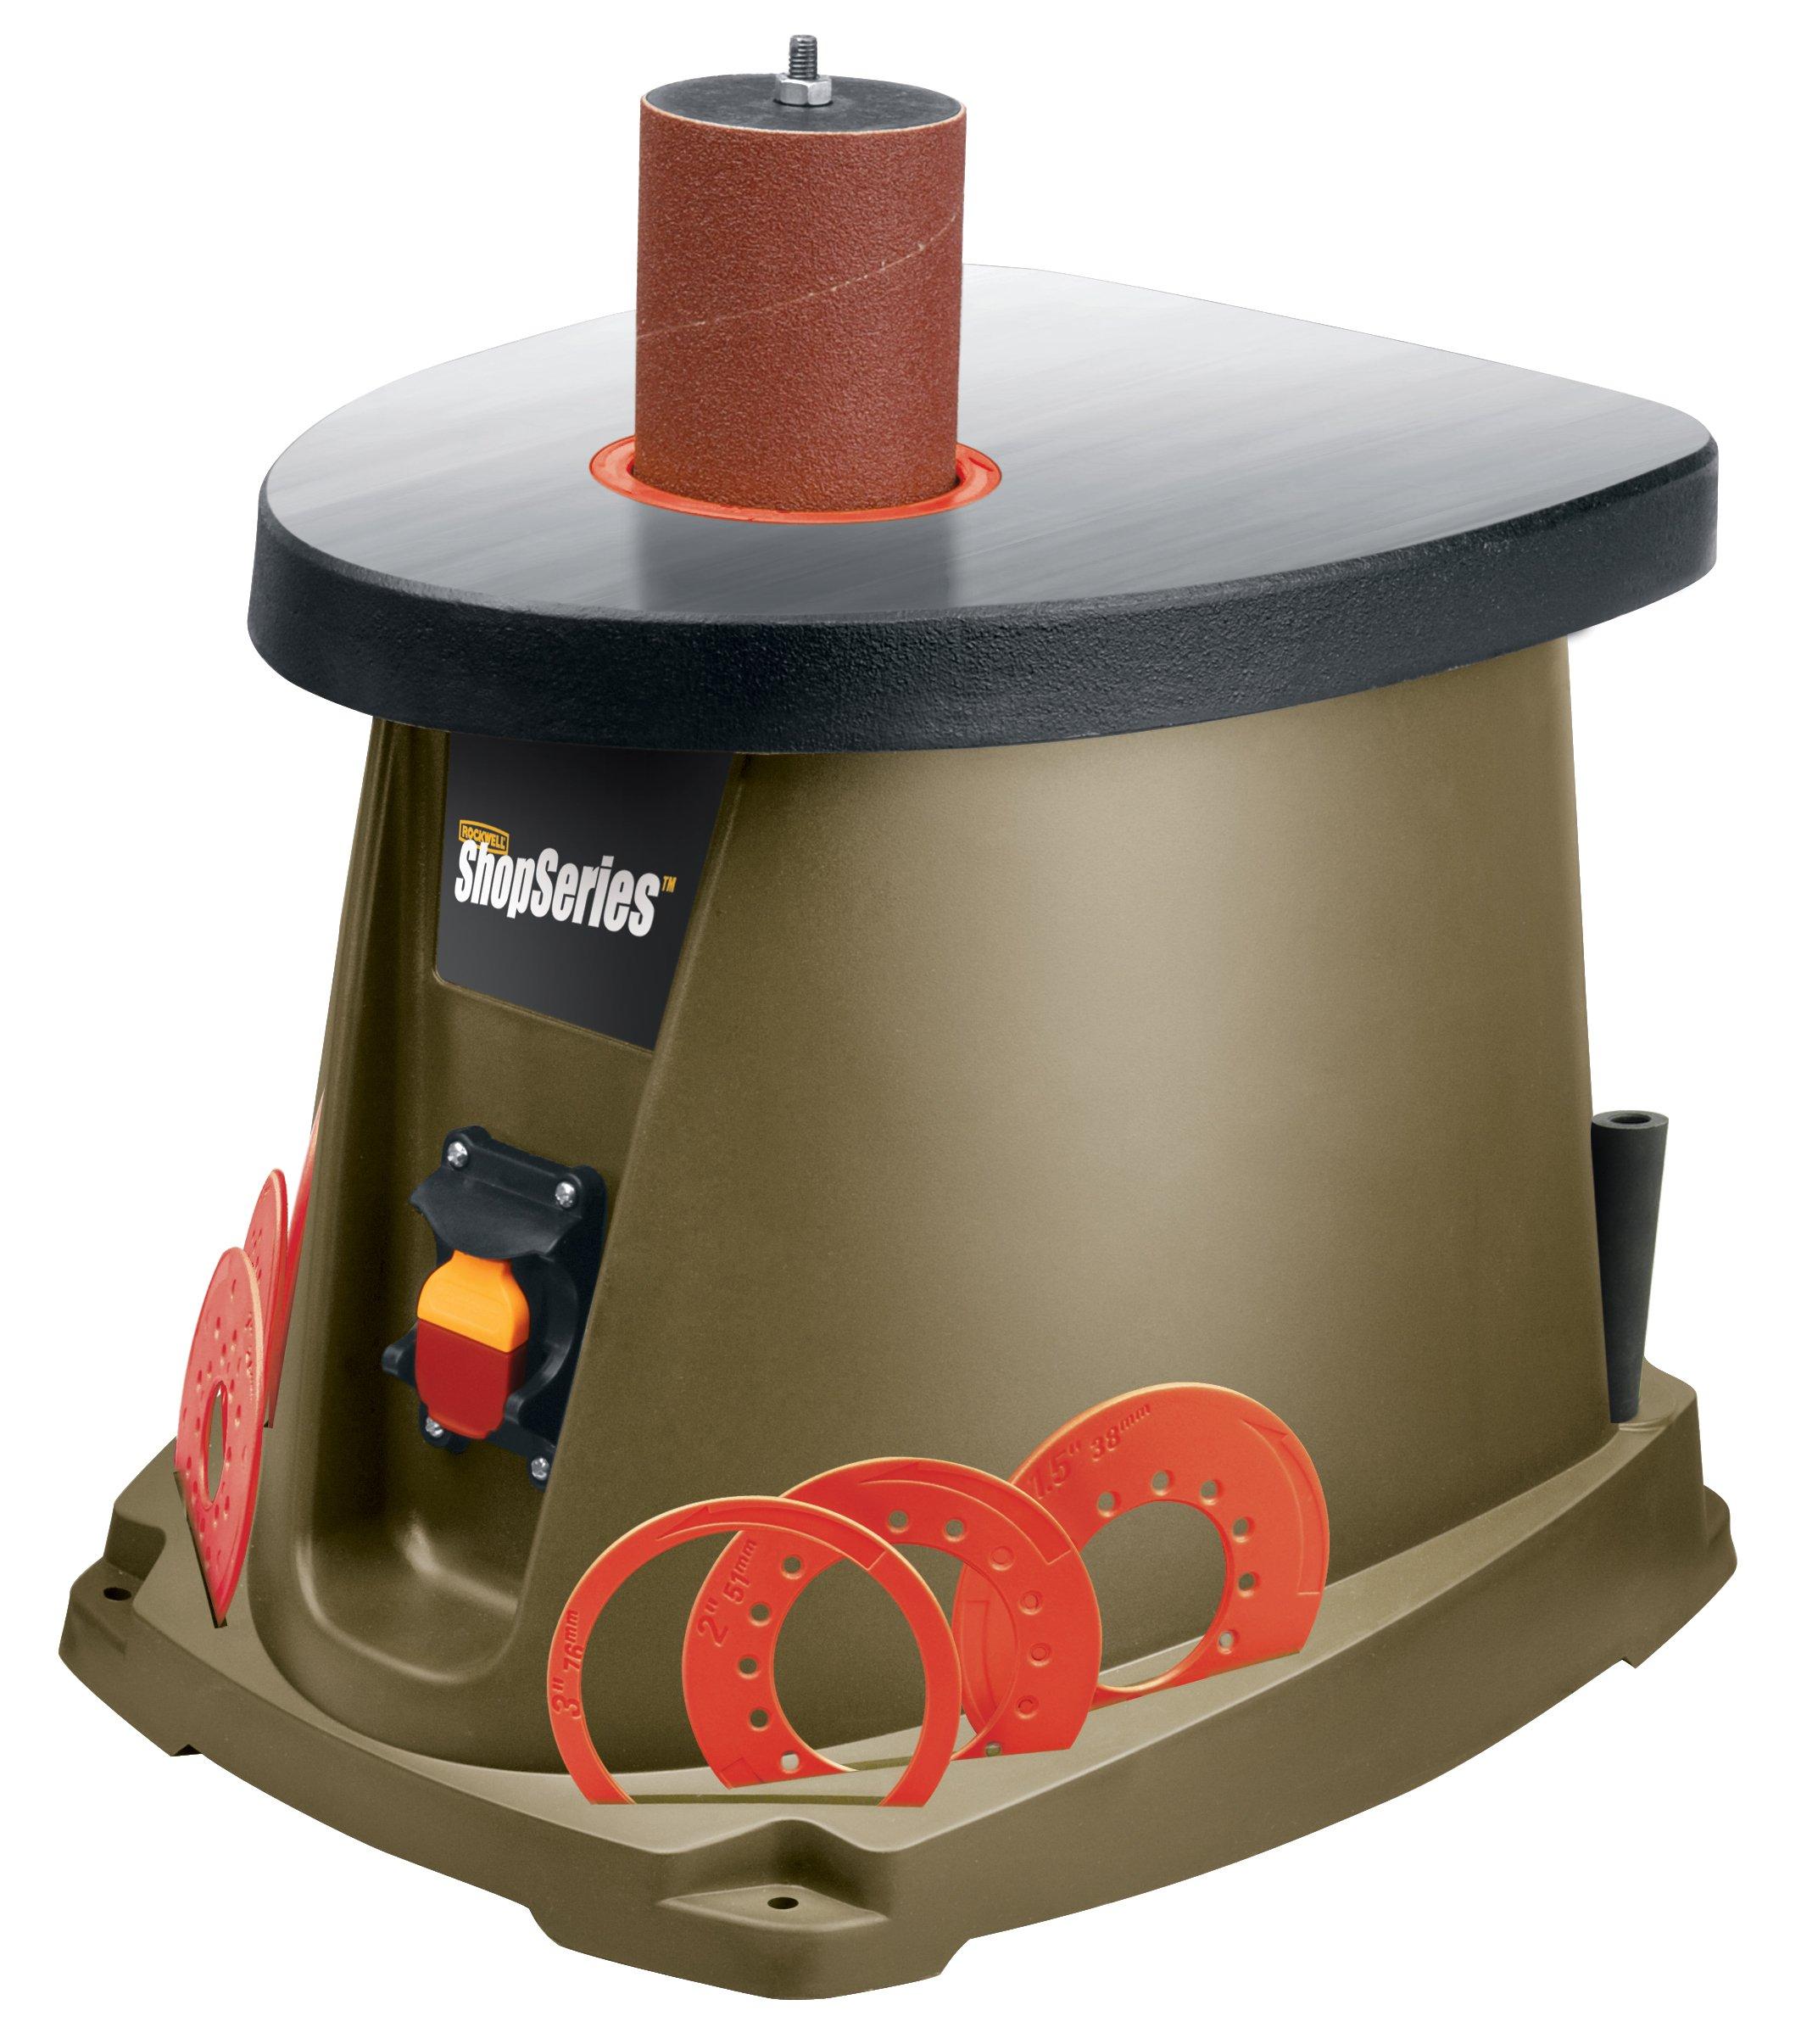 ShopSeries RK9011 3.5-Amp Oscillating Spindle Sander Kit by Rockwell